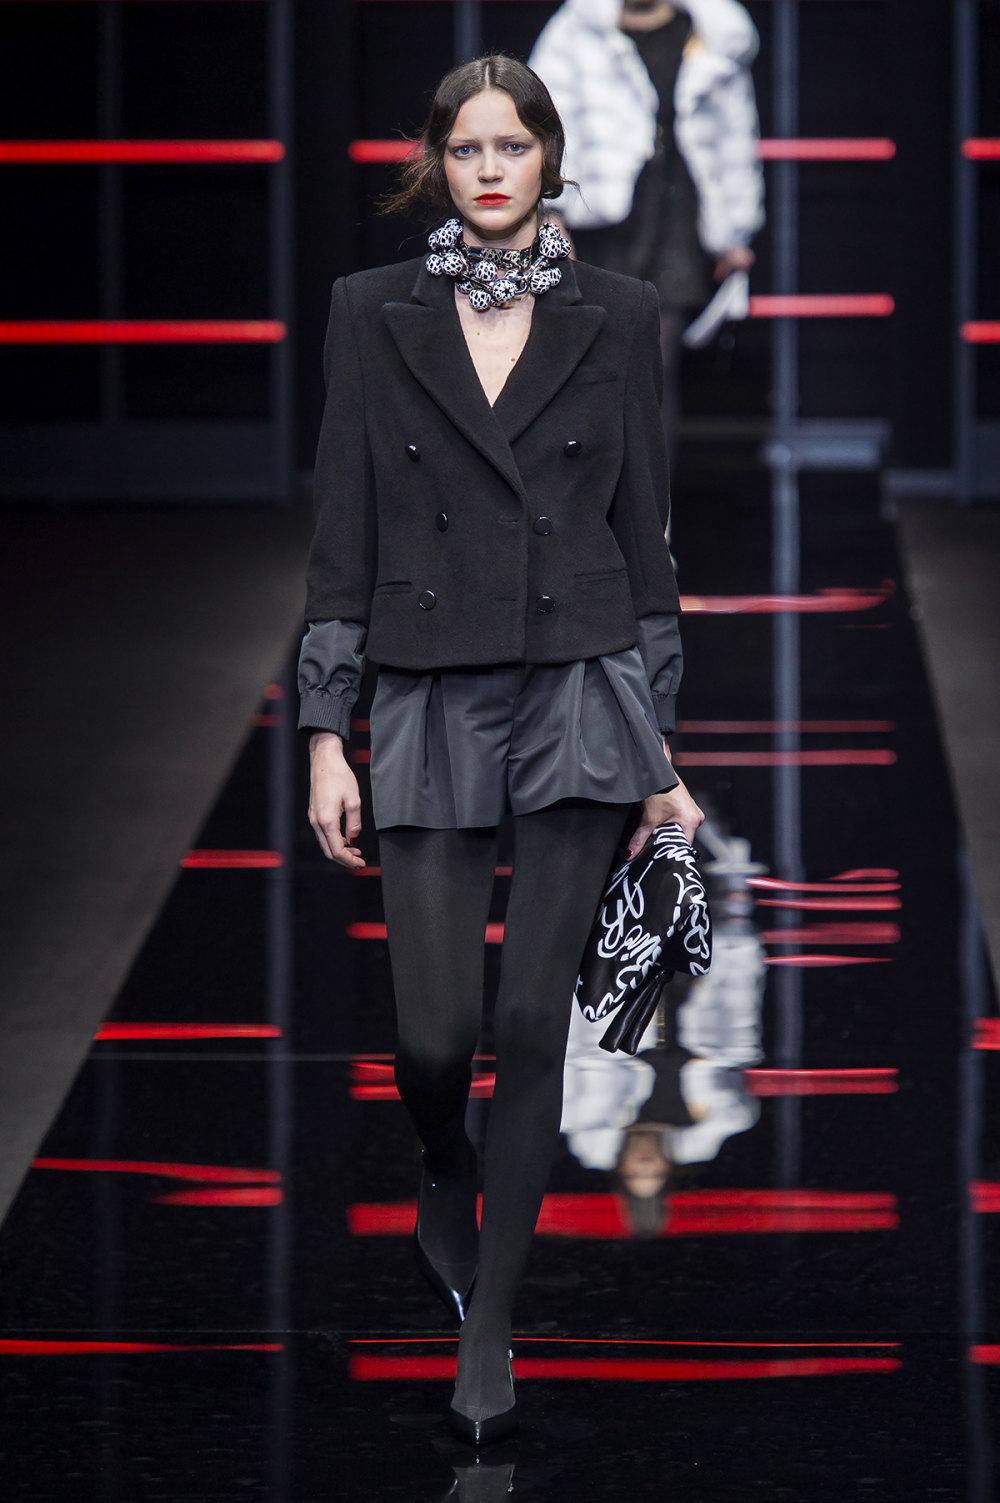 Emporio Armani时装系列畅的裤子带有柔滑裙子的鸡尾酒礼服-27.jpg